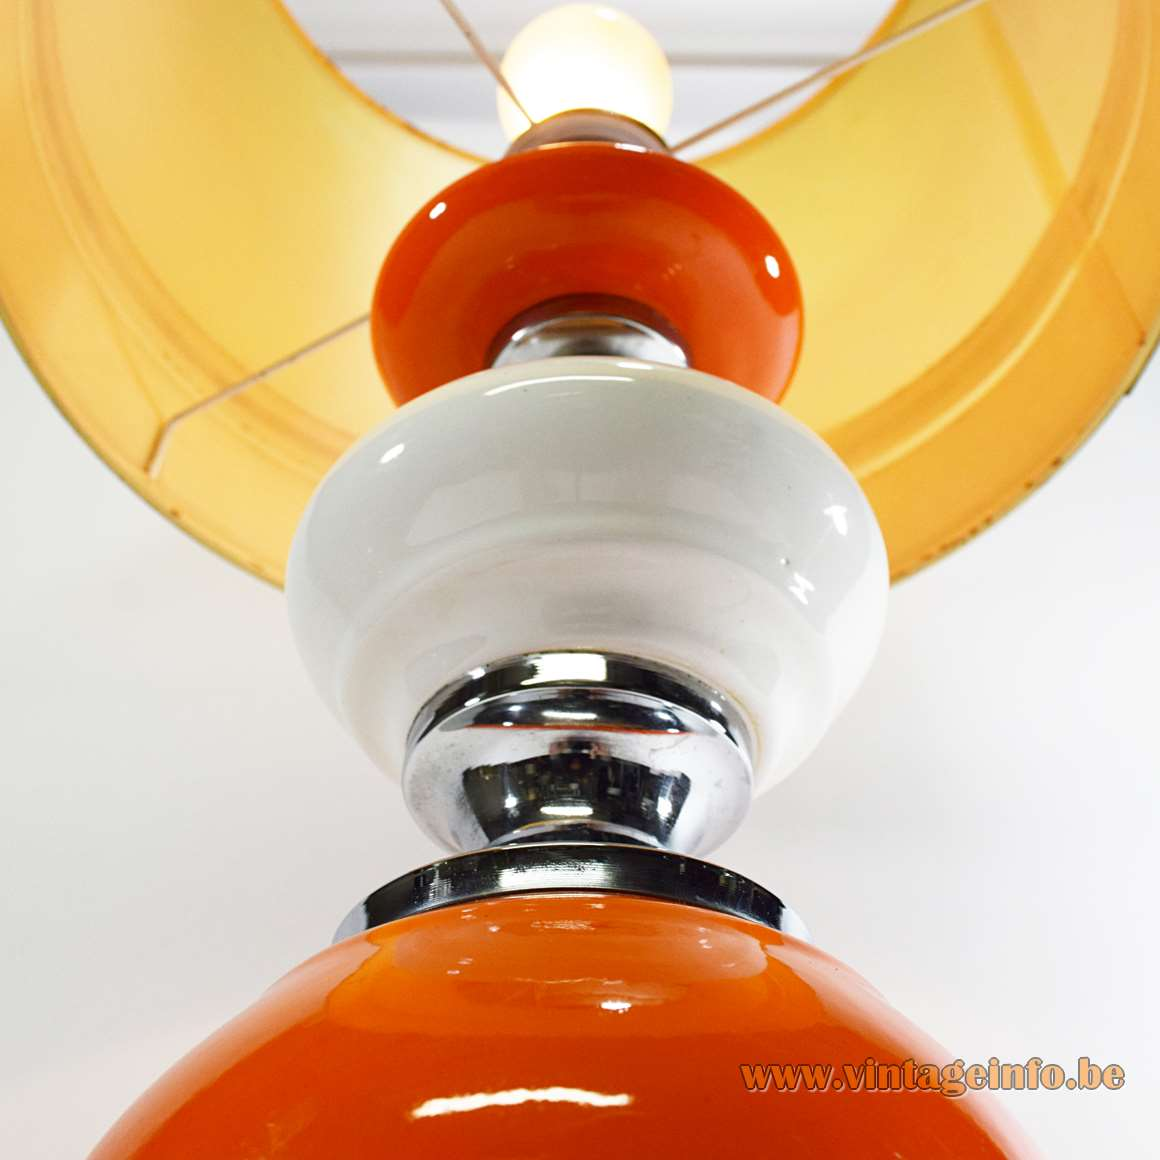 Orange and white ceramics geometric table lamp round chrome base hexagonal Barbier style globe 1960s 1970s MCM Massive